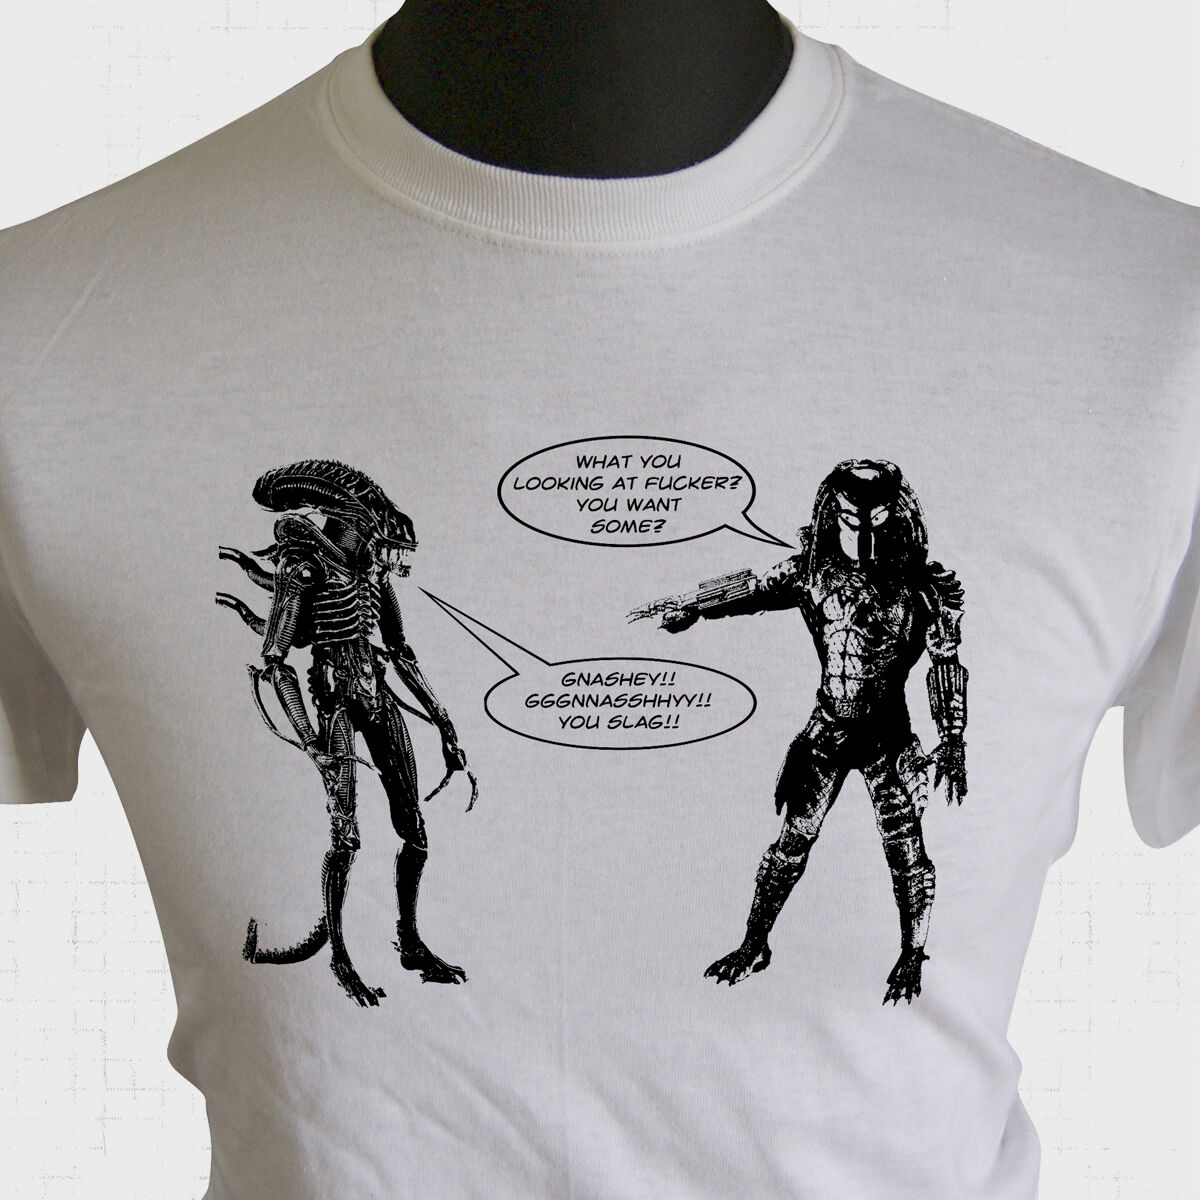 39a0b2c2b Details about Alien vs Predator Joke T Shirt Cockney Essex AVP Xenomorph  Cool Funny Tee